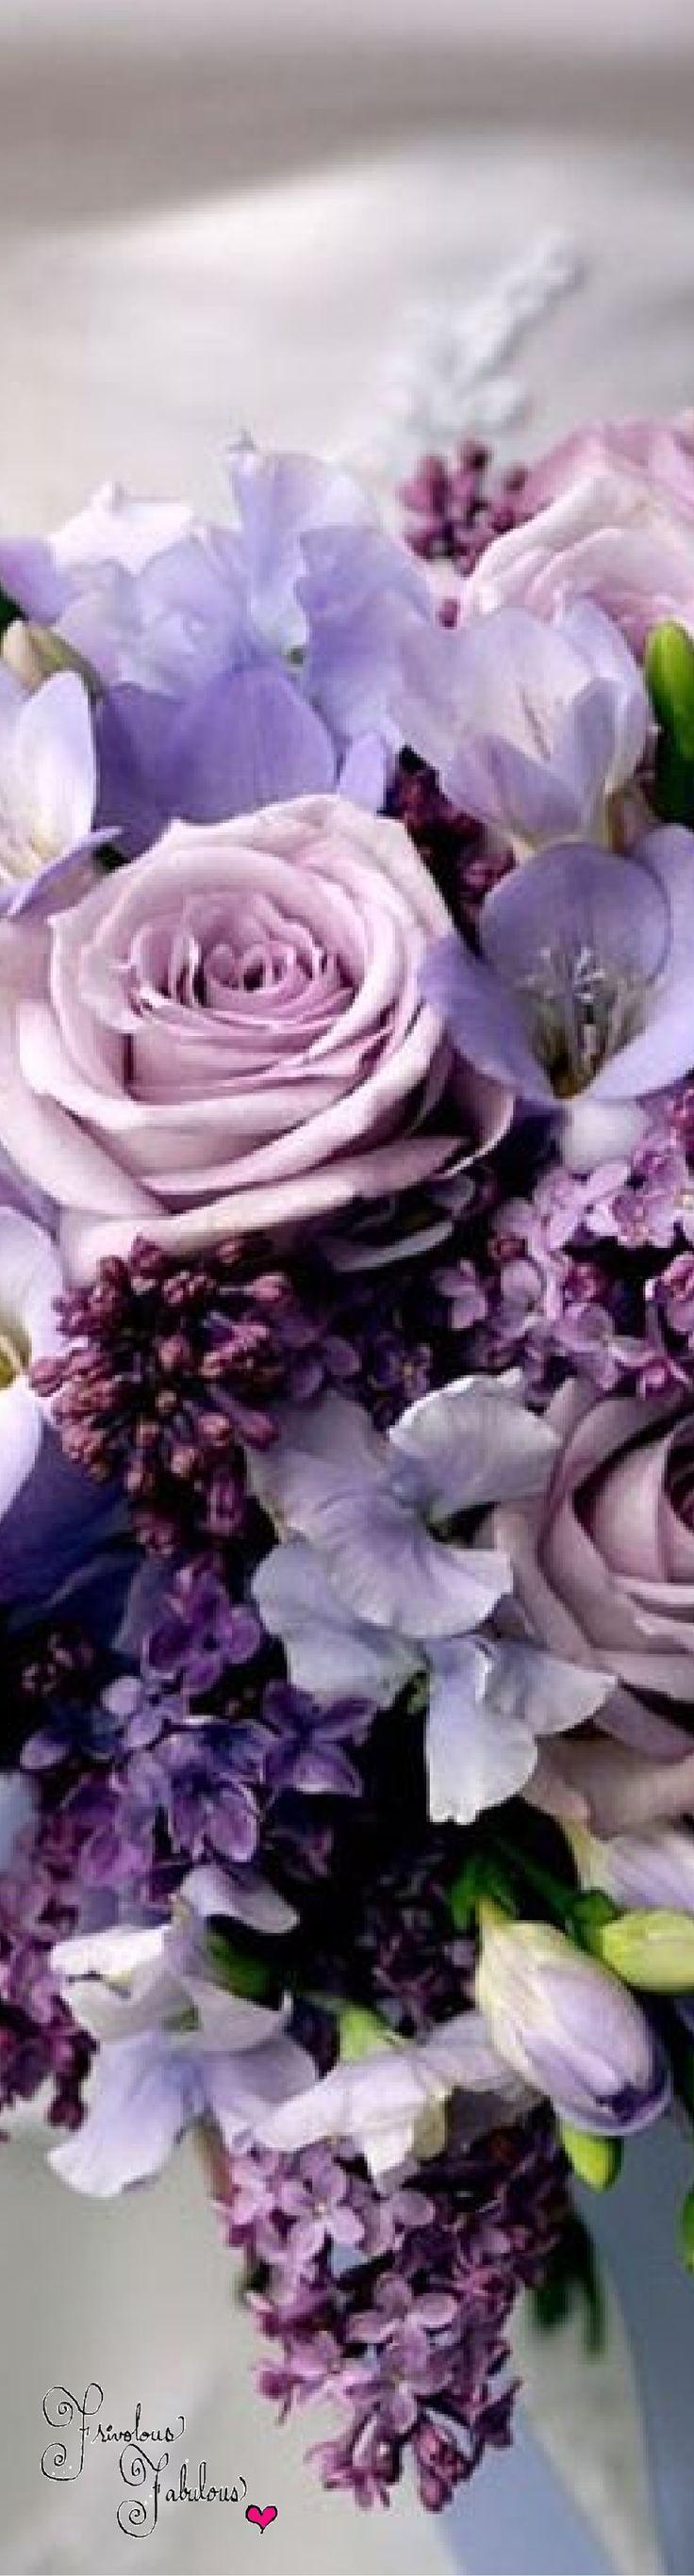 Fabulous Southern Roses Frivolous Fabulous - Wedding Bouquet of Lavender and Purple Roses